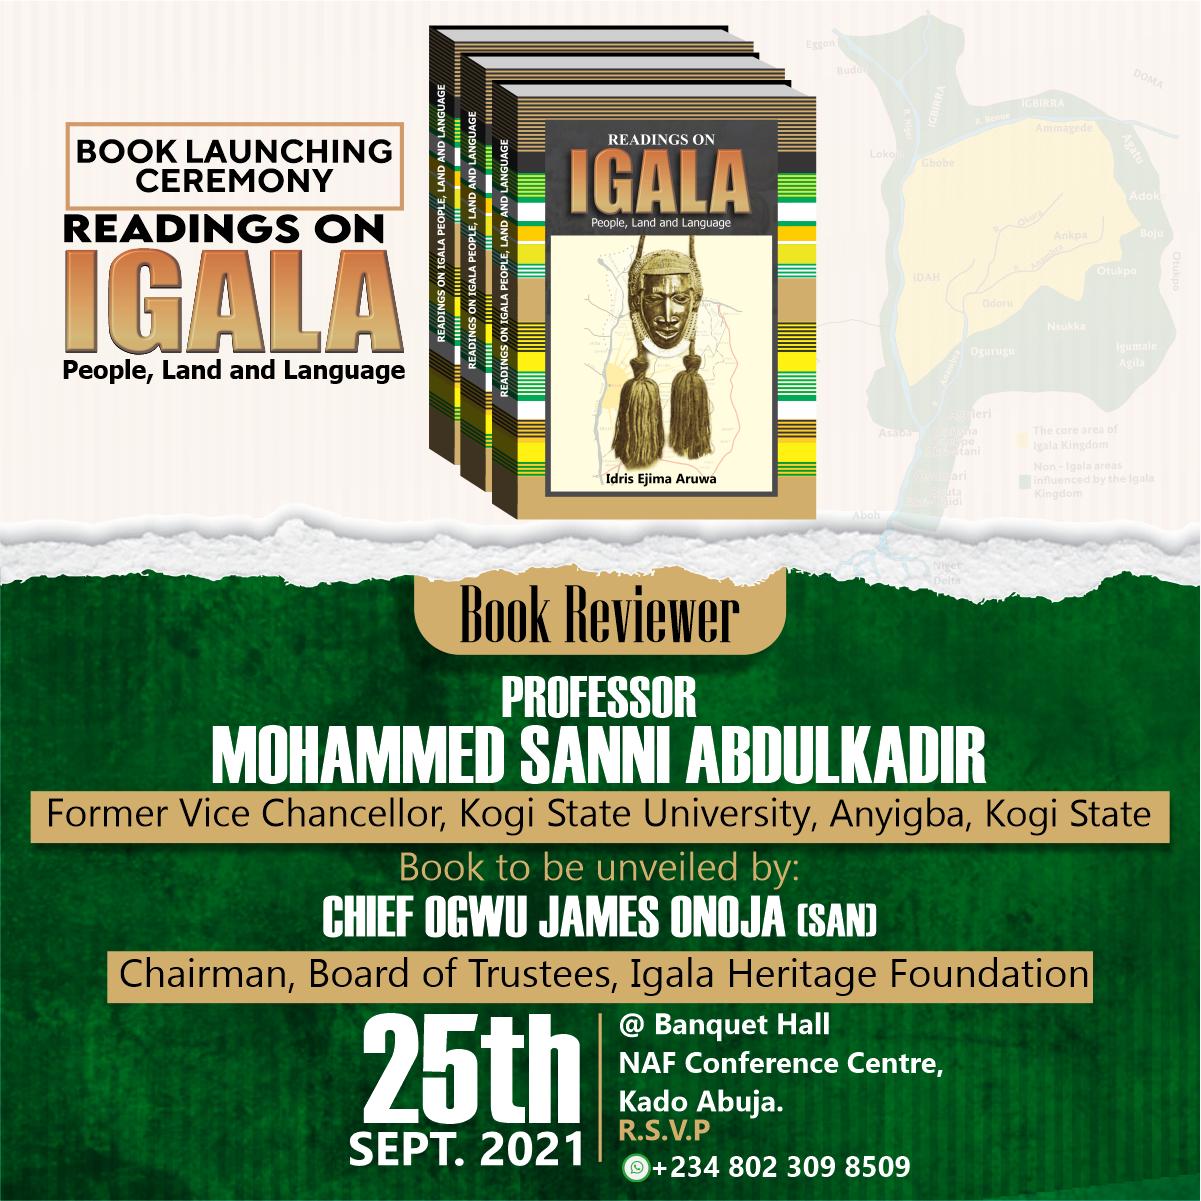 READINGS ON IGALA PEOPLE, LAND AND LANGUAGE